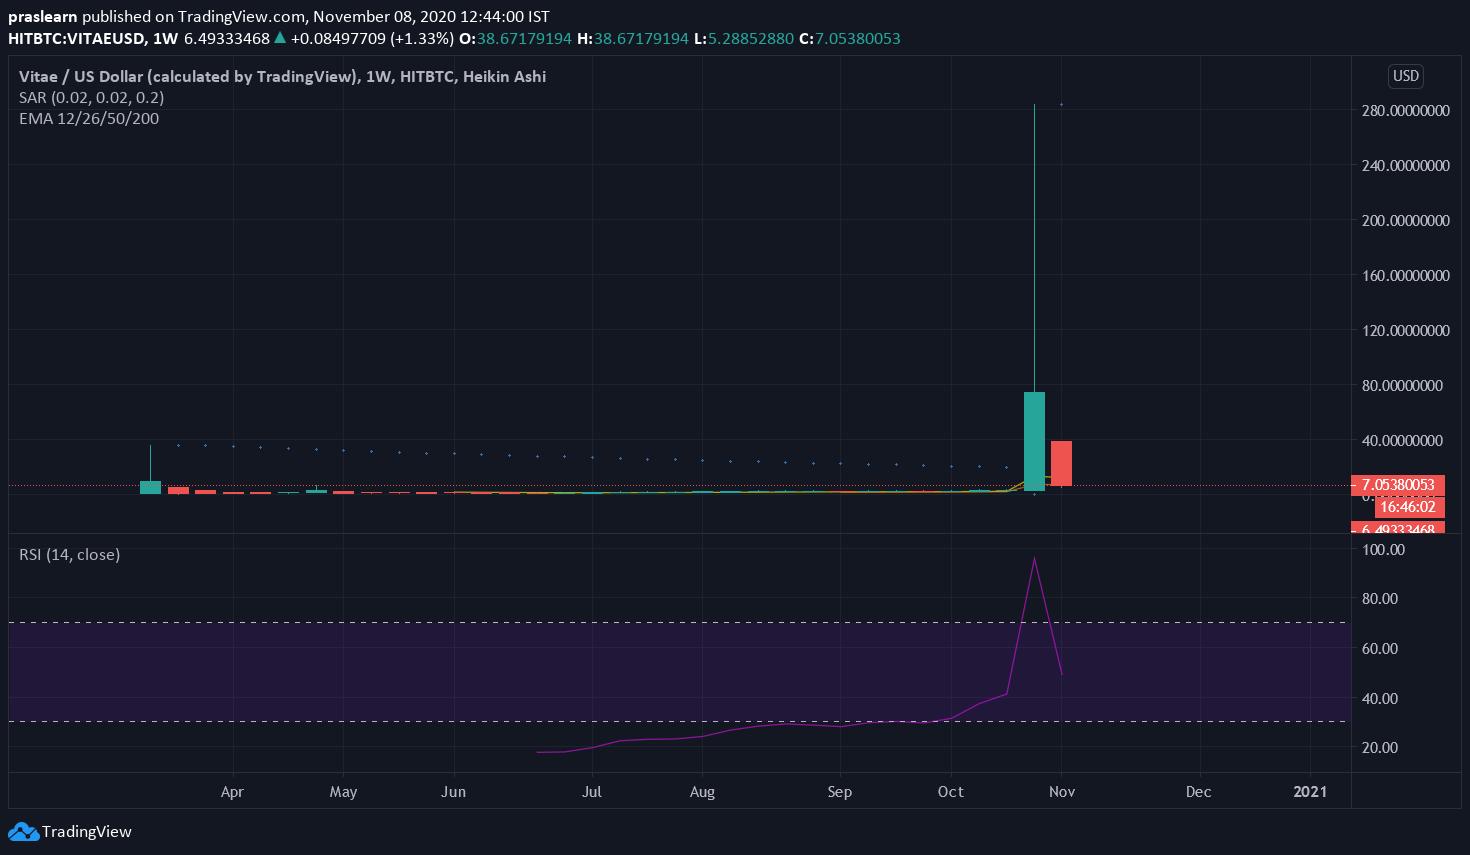 VITAE/USD Weekly Chart: Tradingview